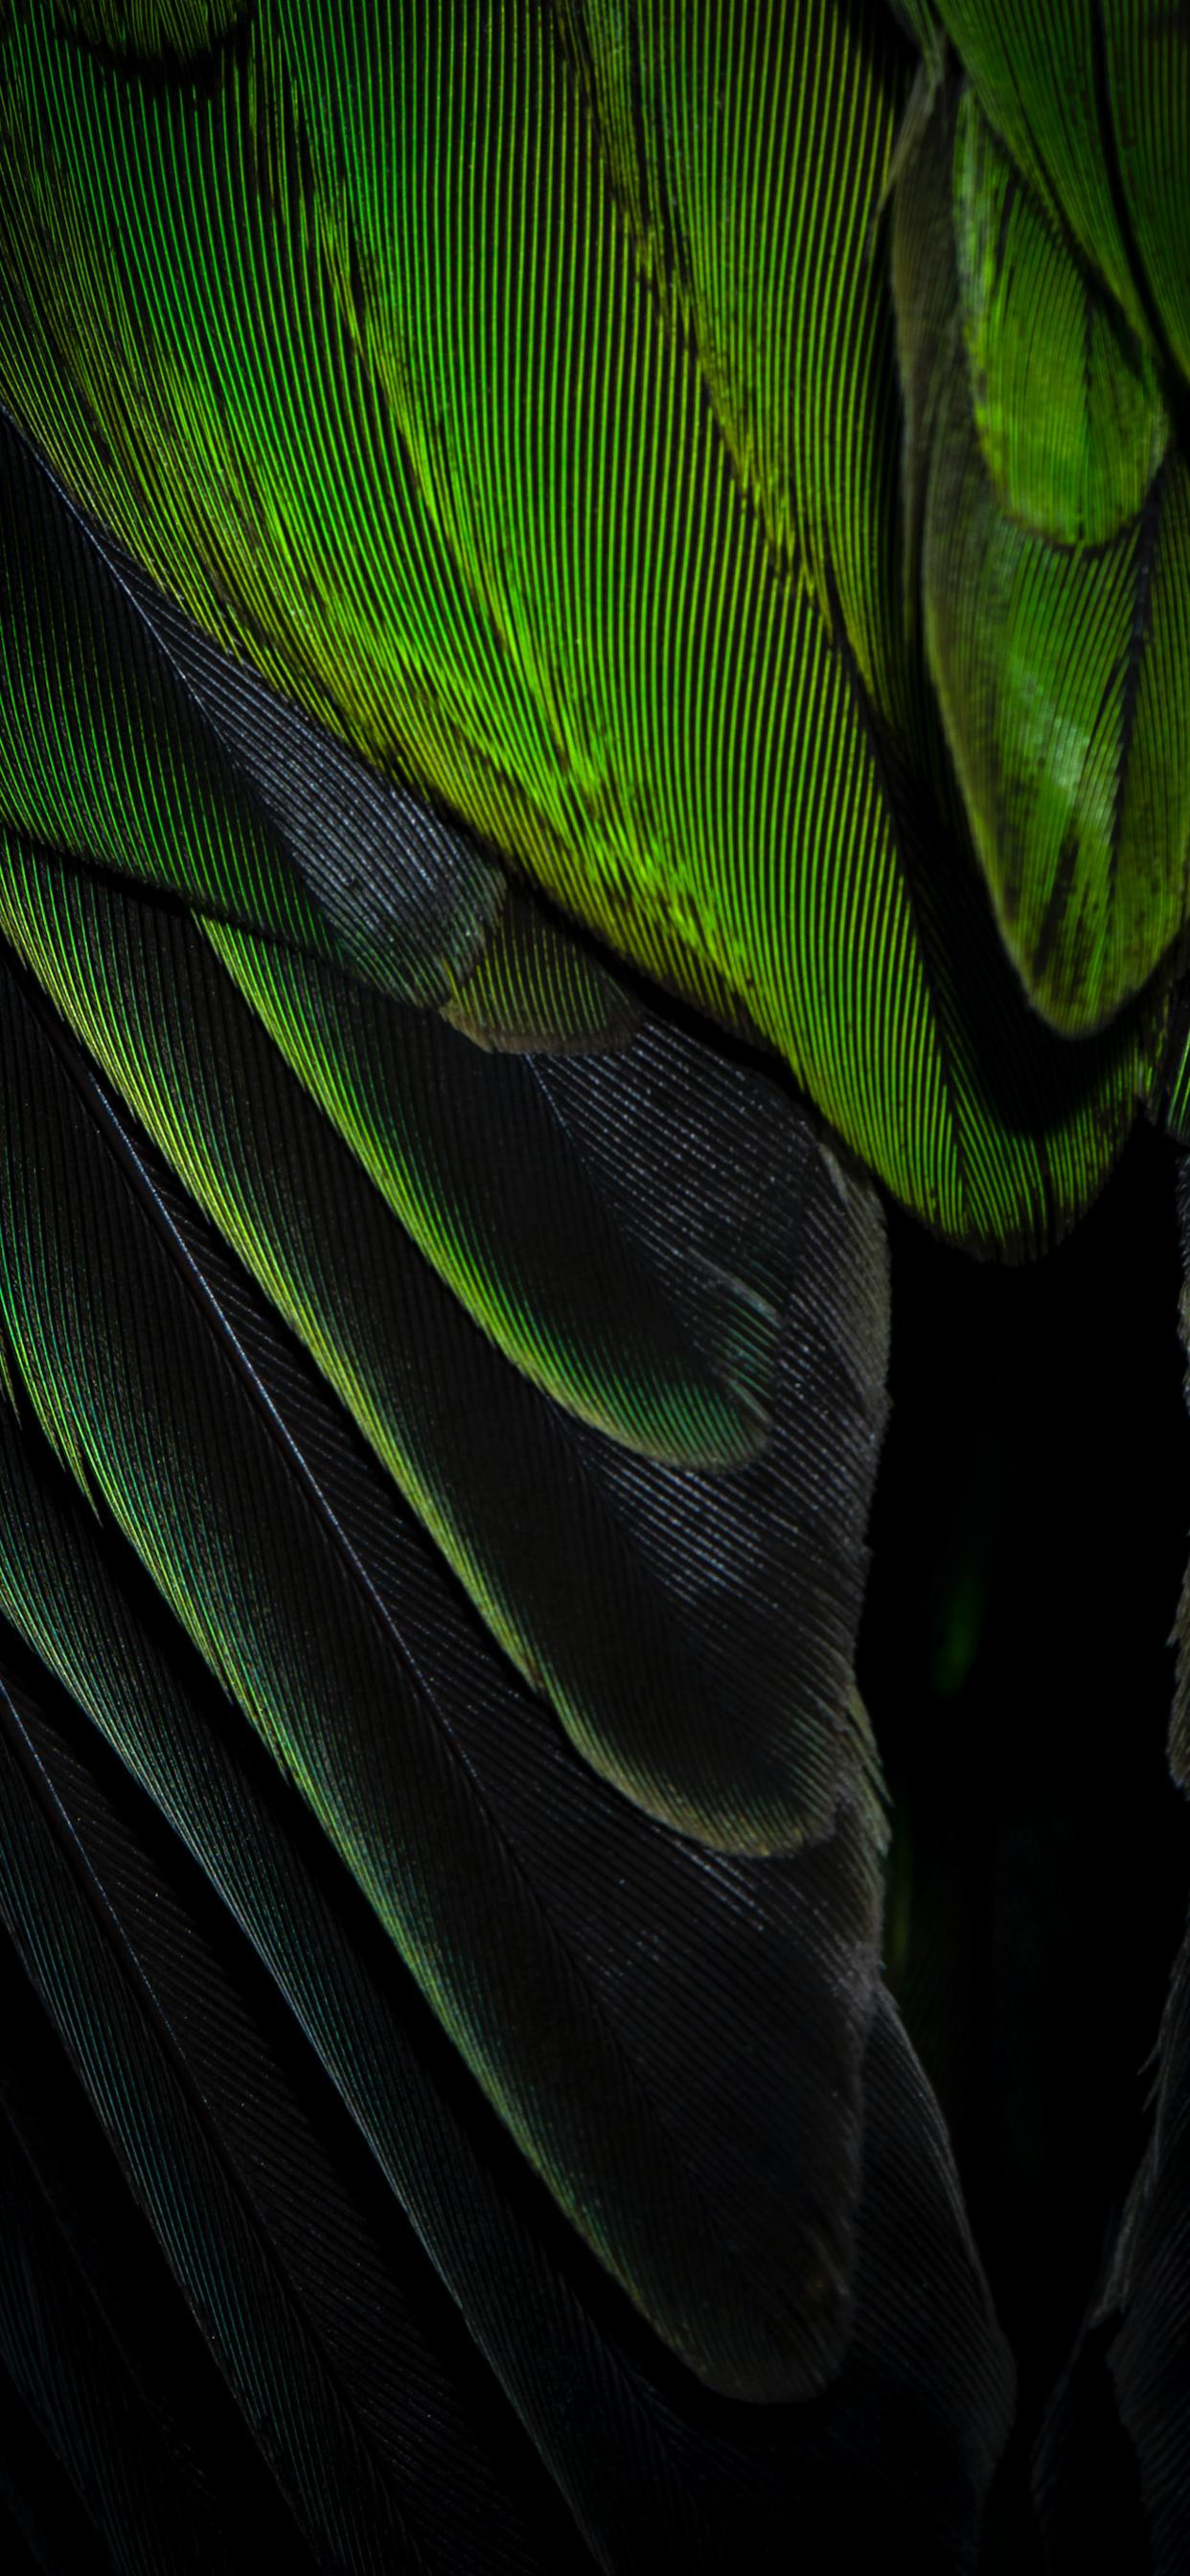 iPhone wallpapers feather green black Fonds d'écran iPhone du 03/04/2020